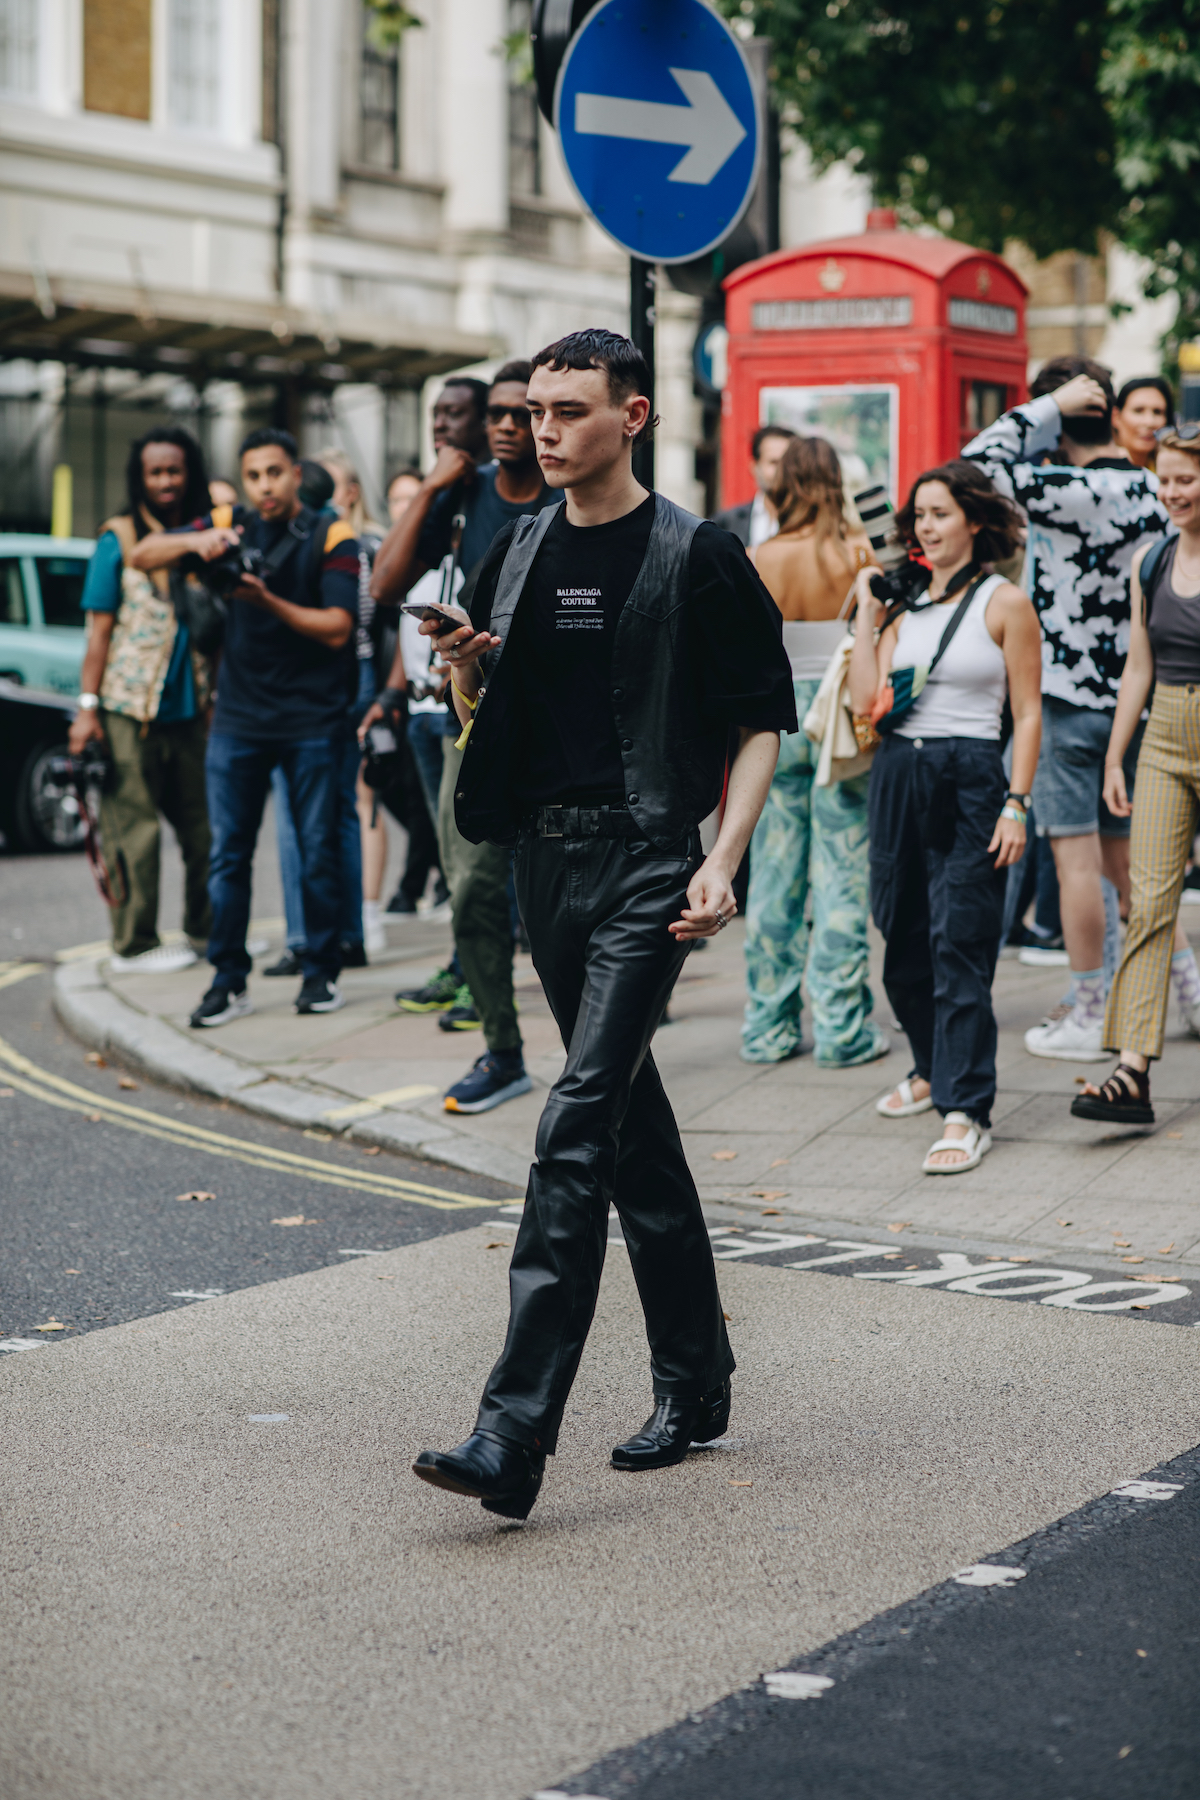 Street Style Shots: London Fashion Week Day 1 & 2